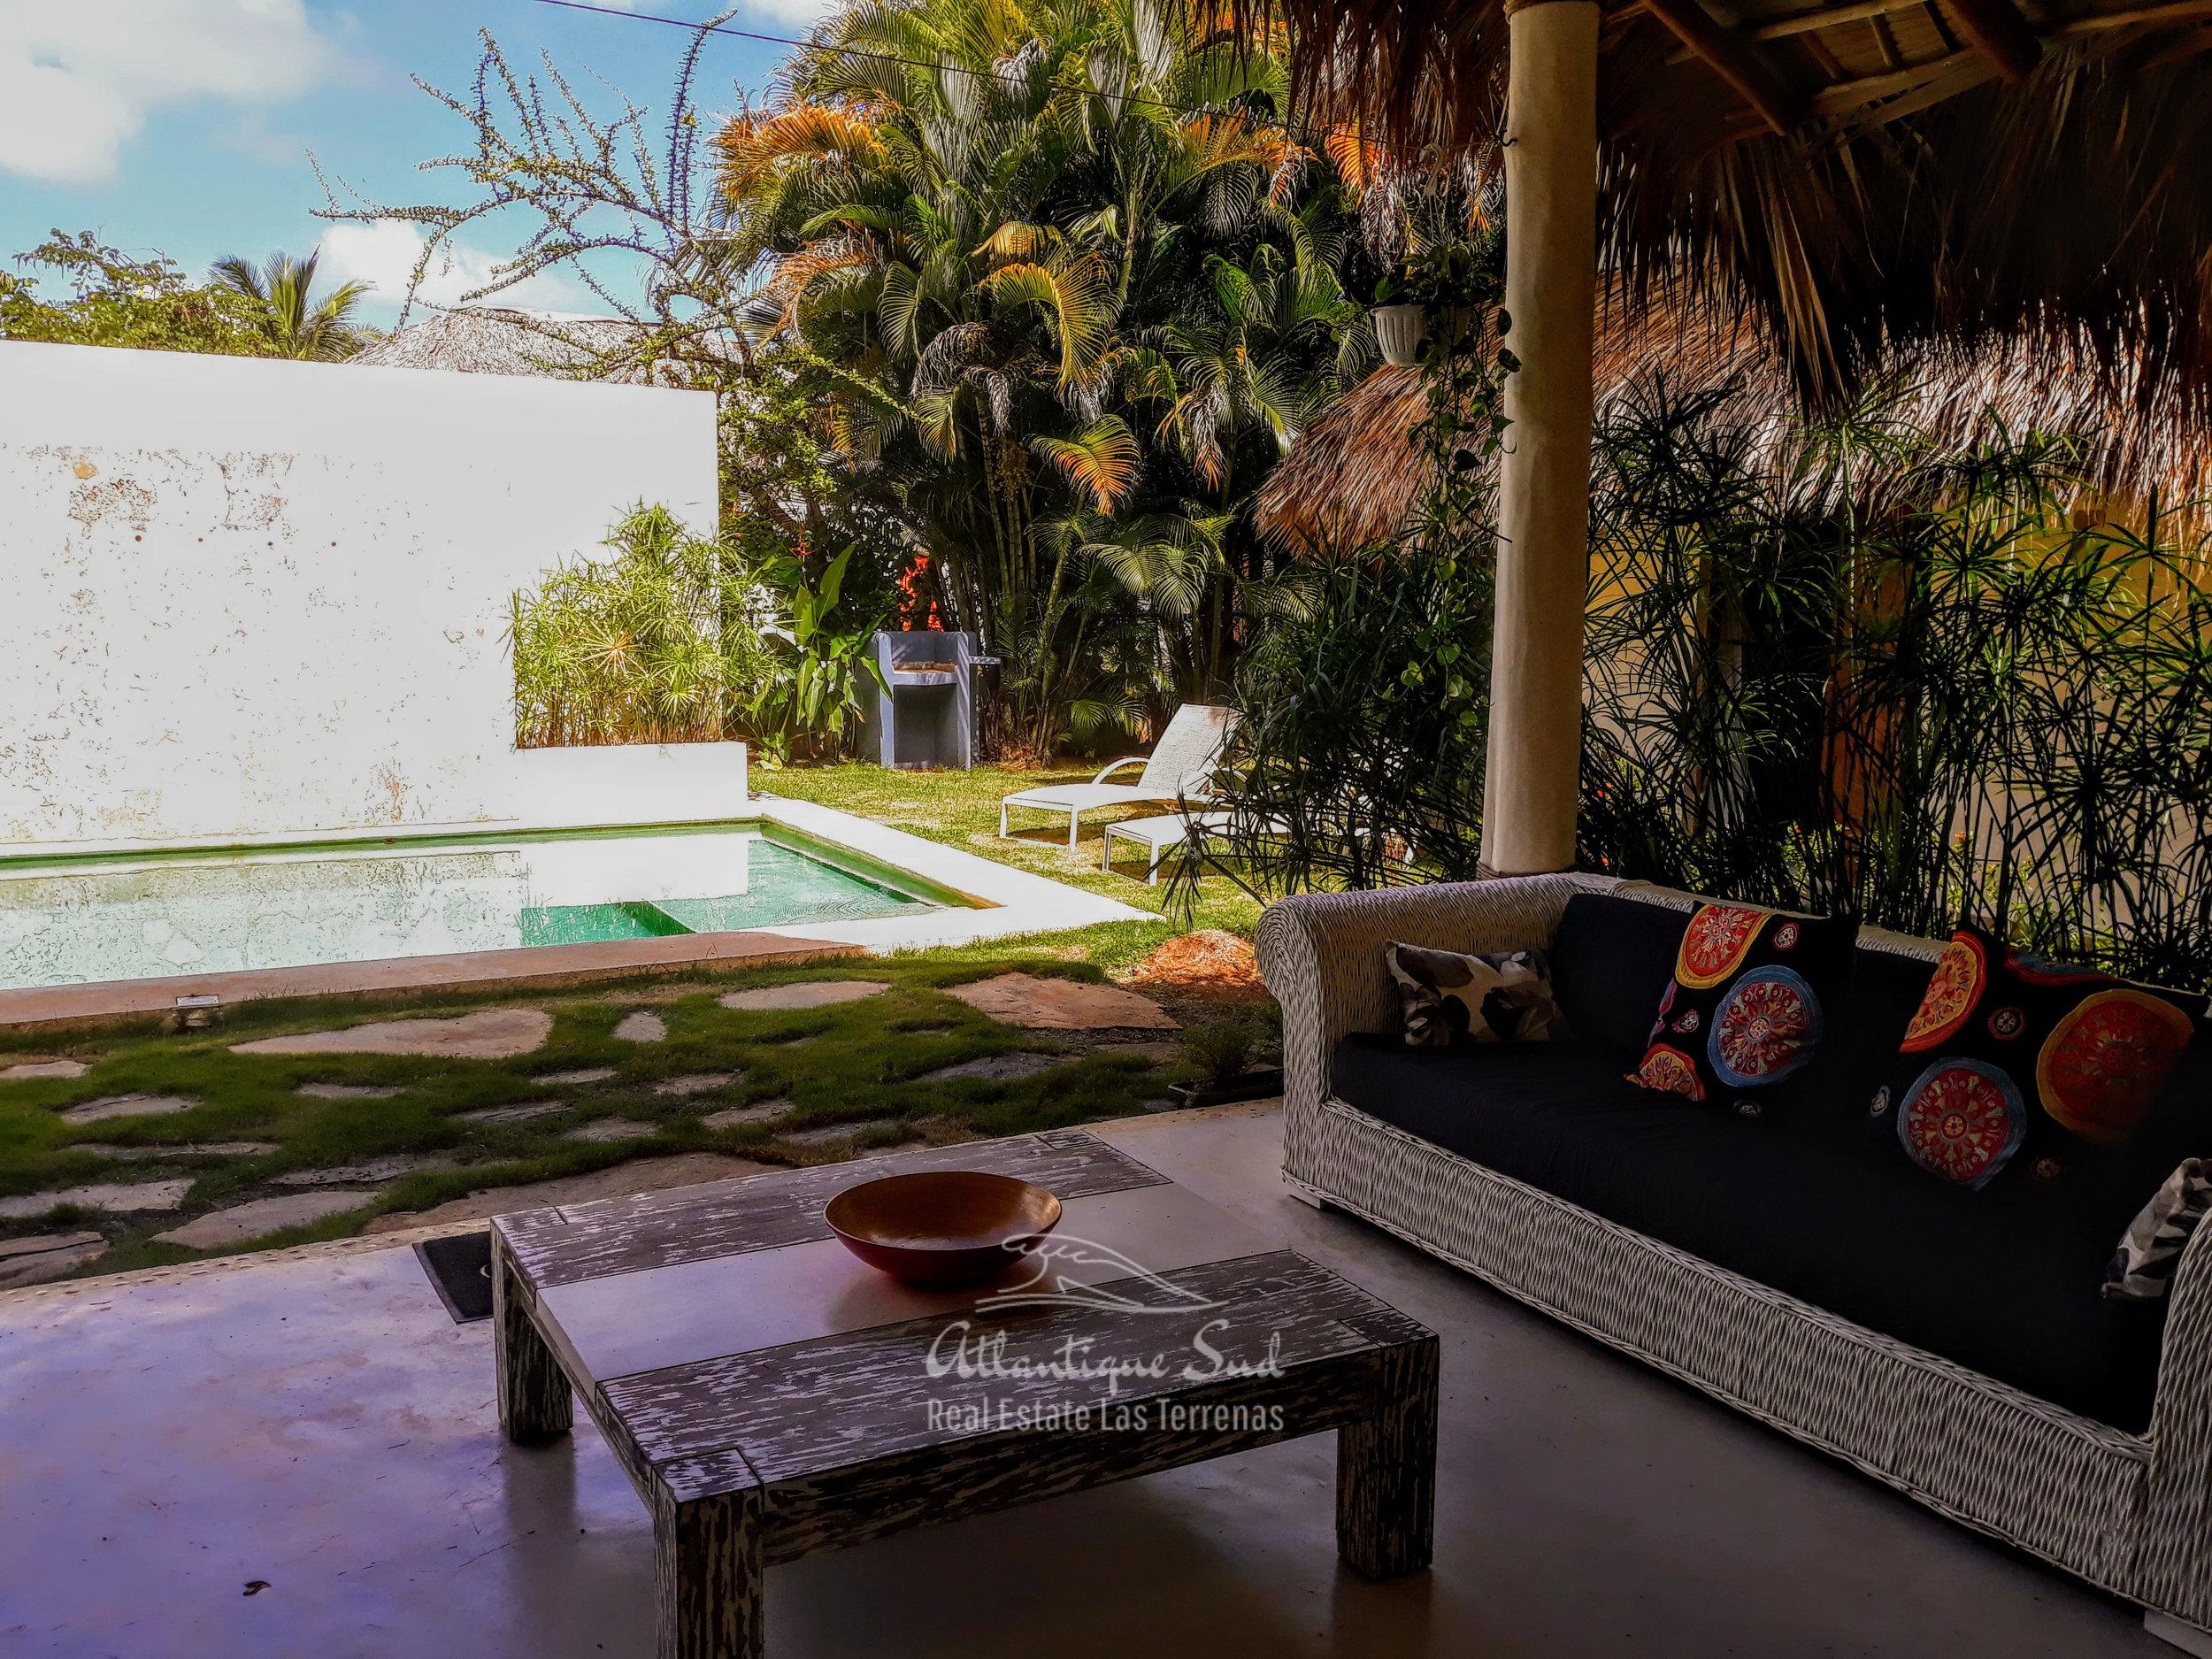 Authentic Caribbean Villa in quiet community in Real Estate Las Terrenas Atlantique Sud3.jpg